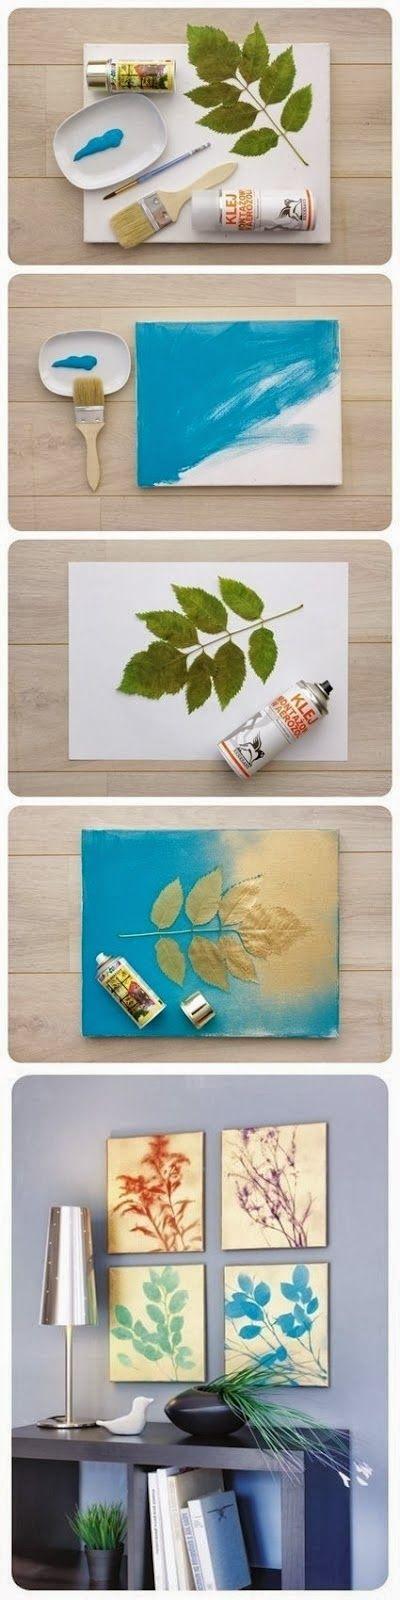 Make a Nature Wall Art on Canvas